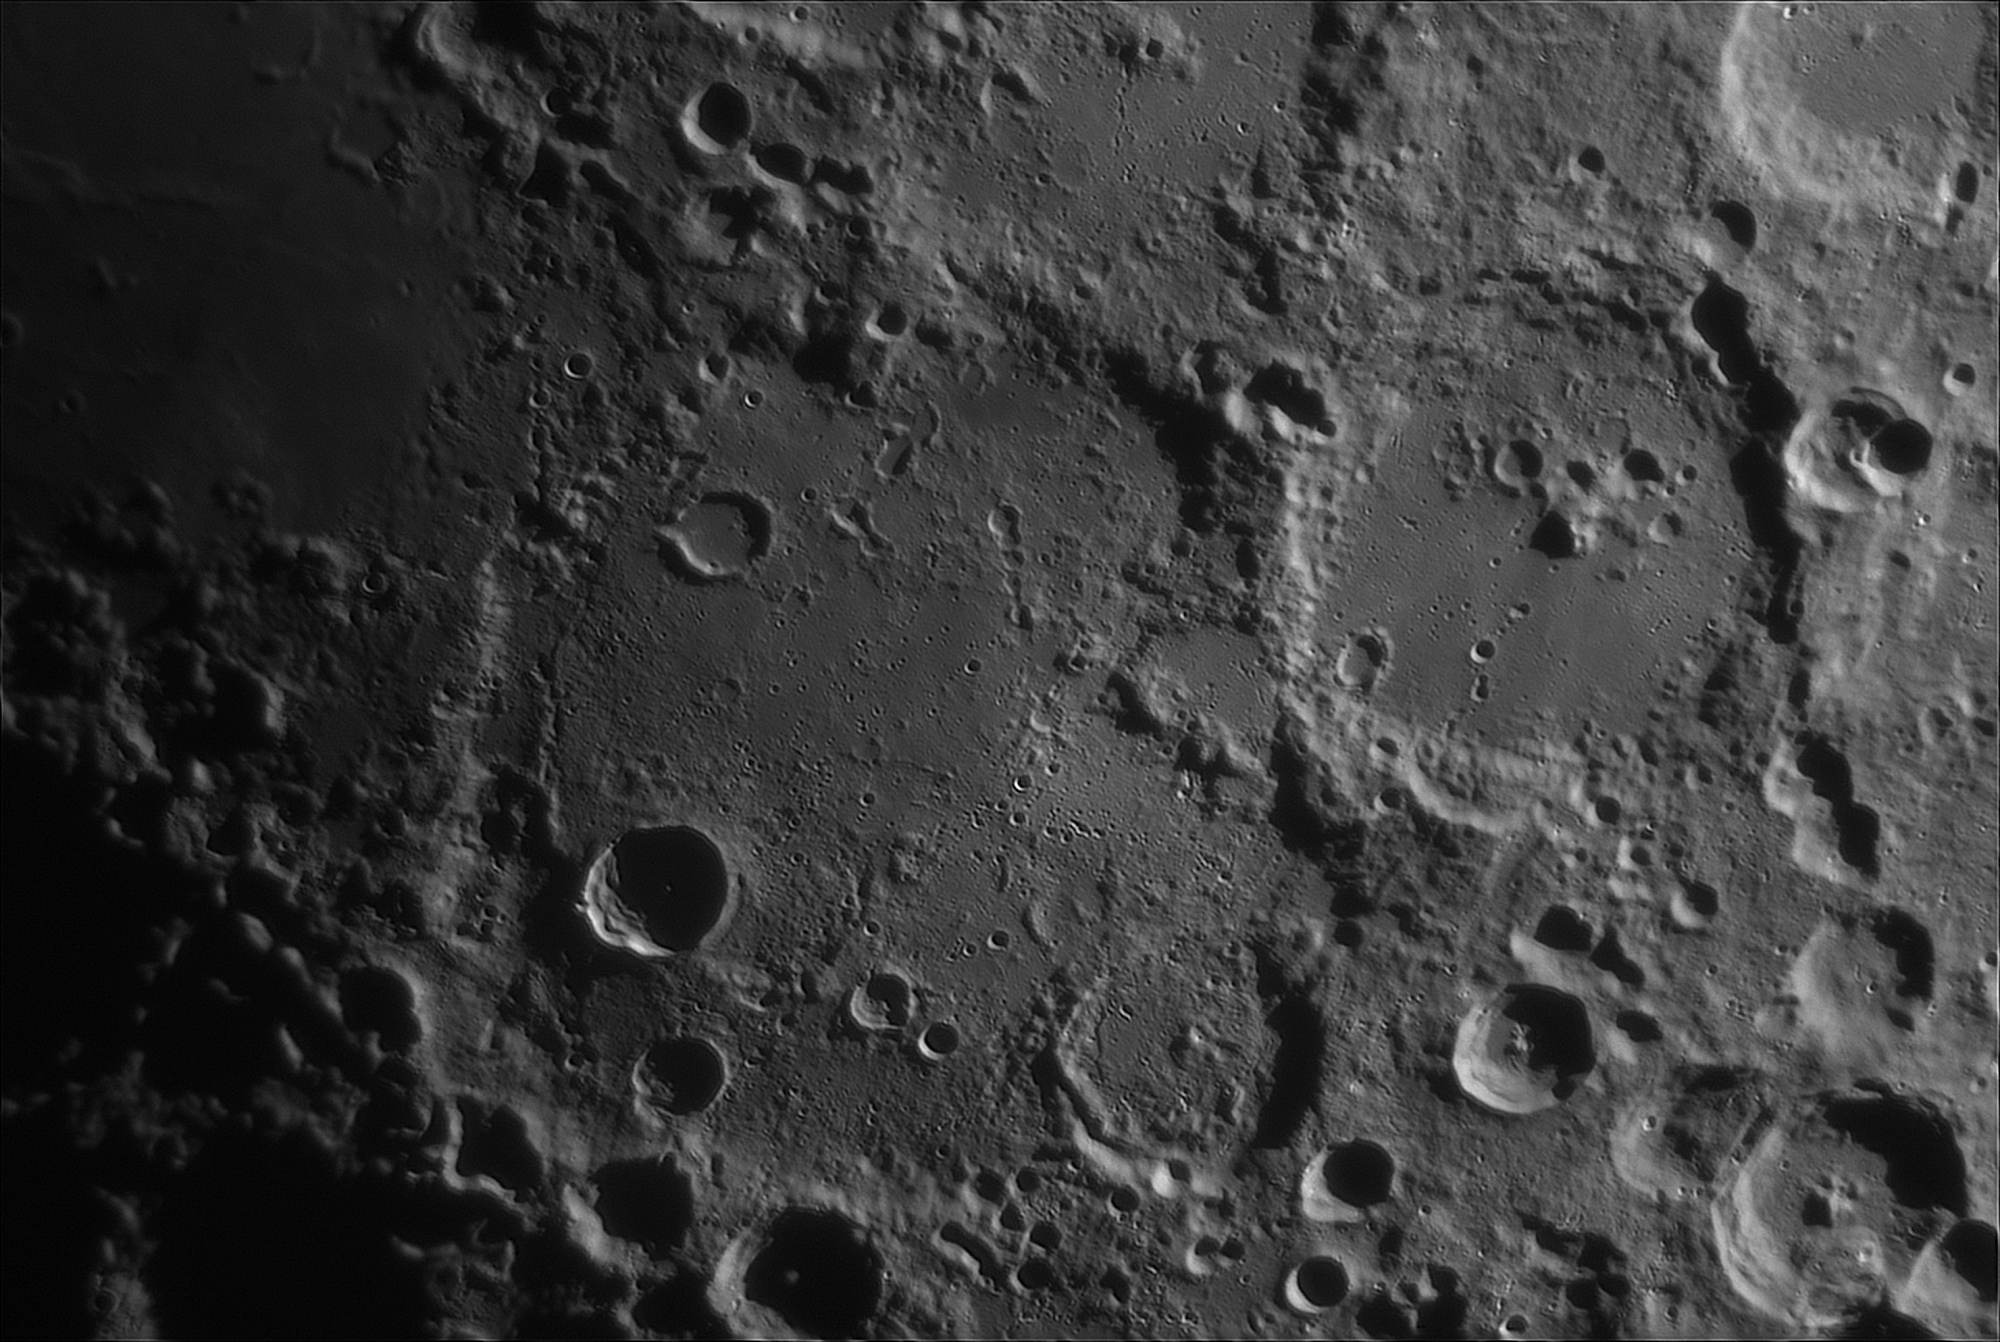 Moon_200530_204855_G__cro_100r_T80_900_reg.thumb.jpg.6b13d41864c52ef61480d3473ab94a67.jpg